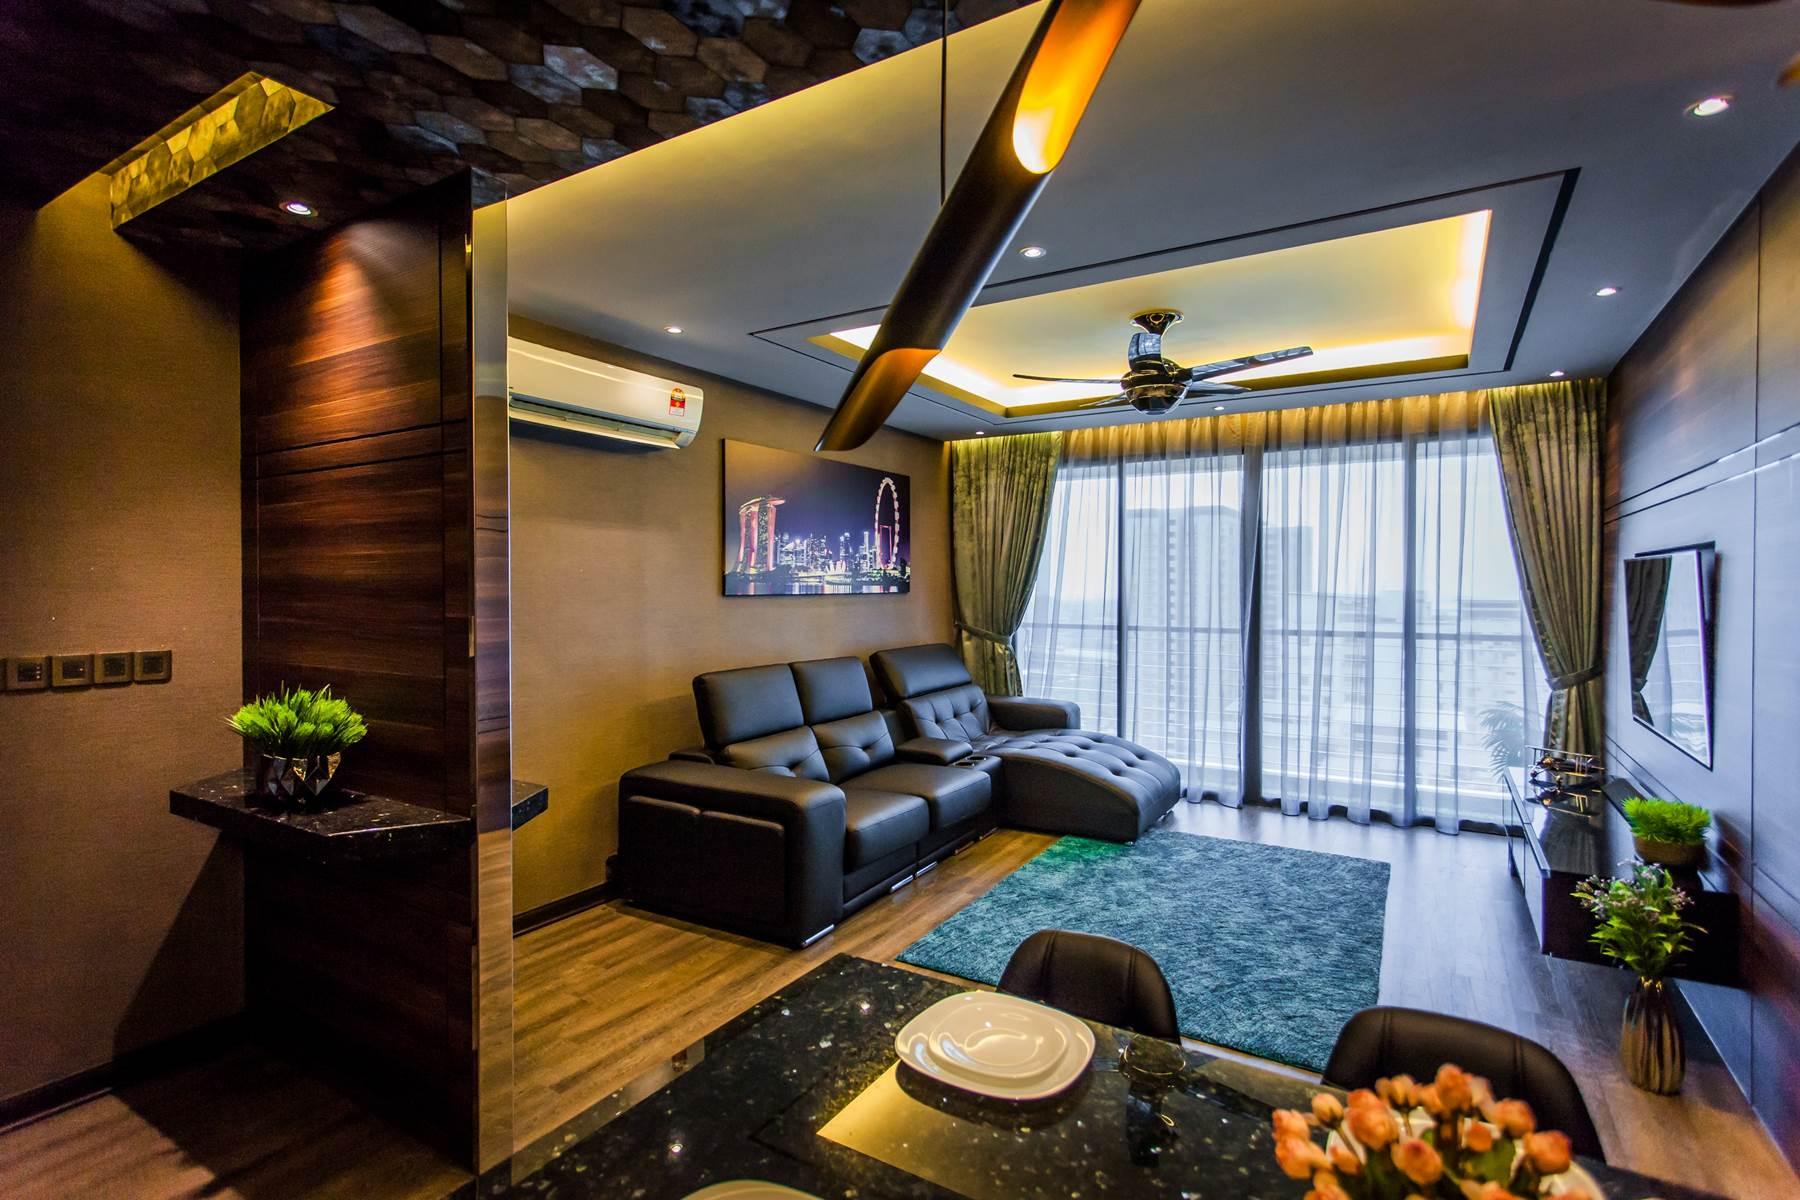 Stylish Modern Condominium Interior Design In Penang Malaysia